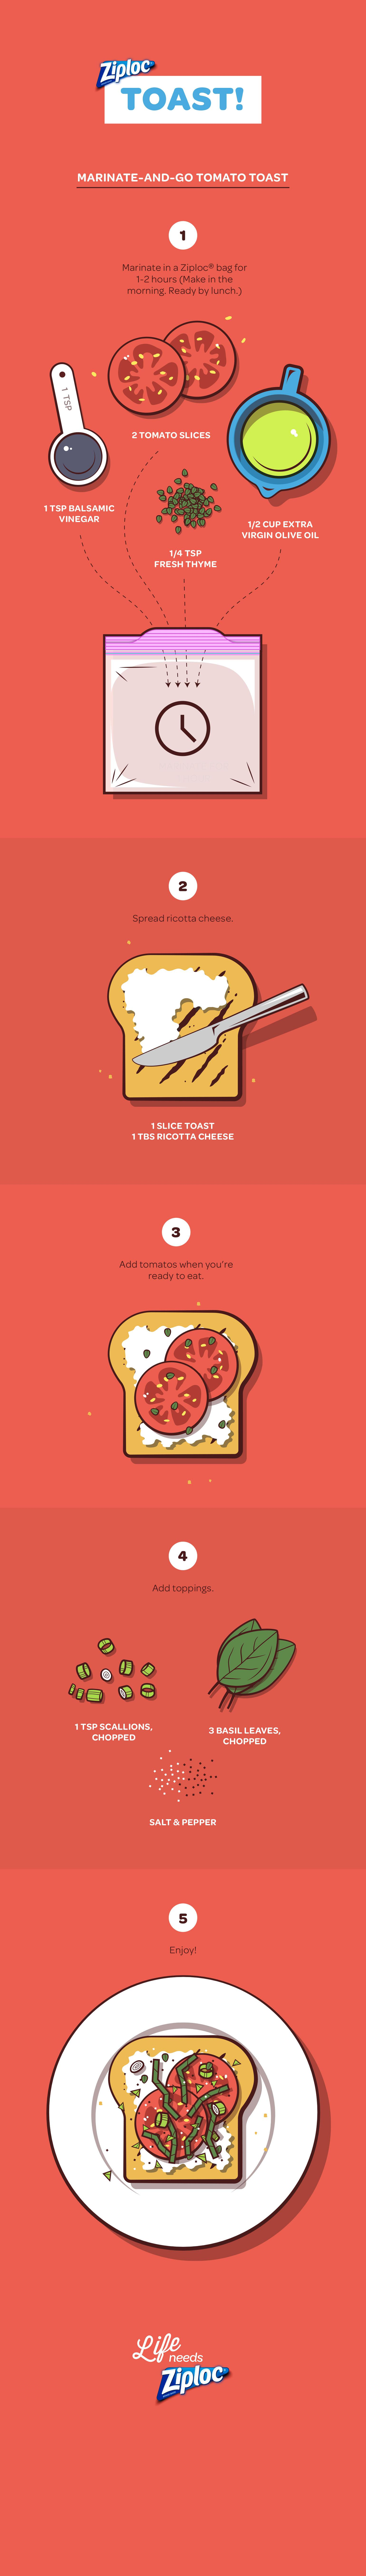 Marinate-And-Go Tomato Toast